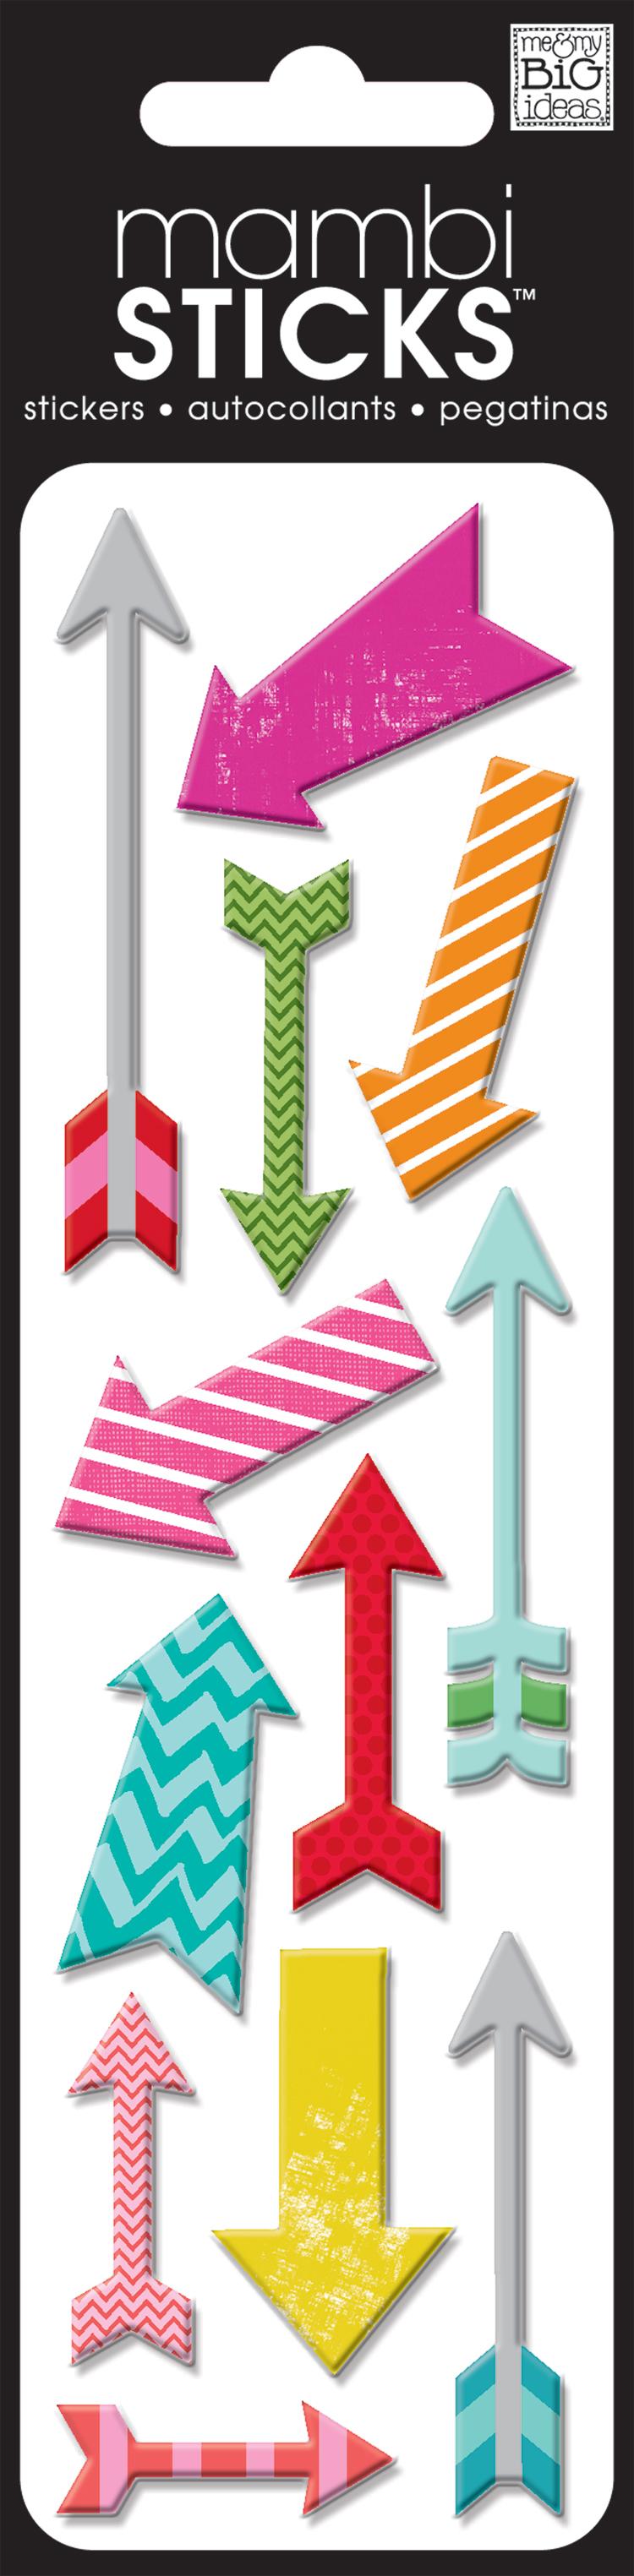 SPXH-243 Multi-colored puffy arrow stickers.